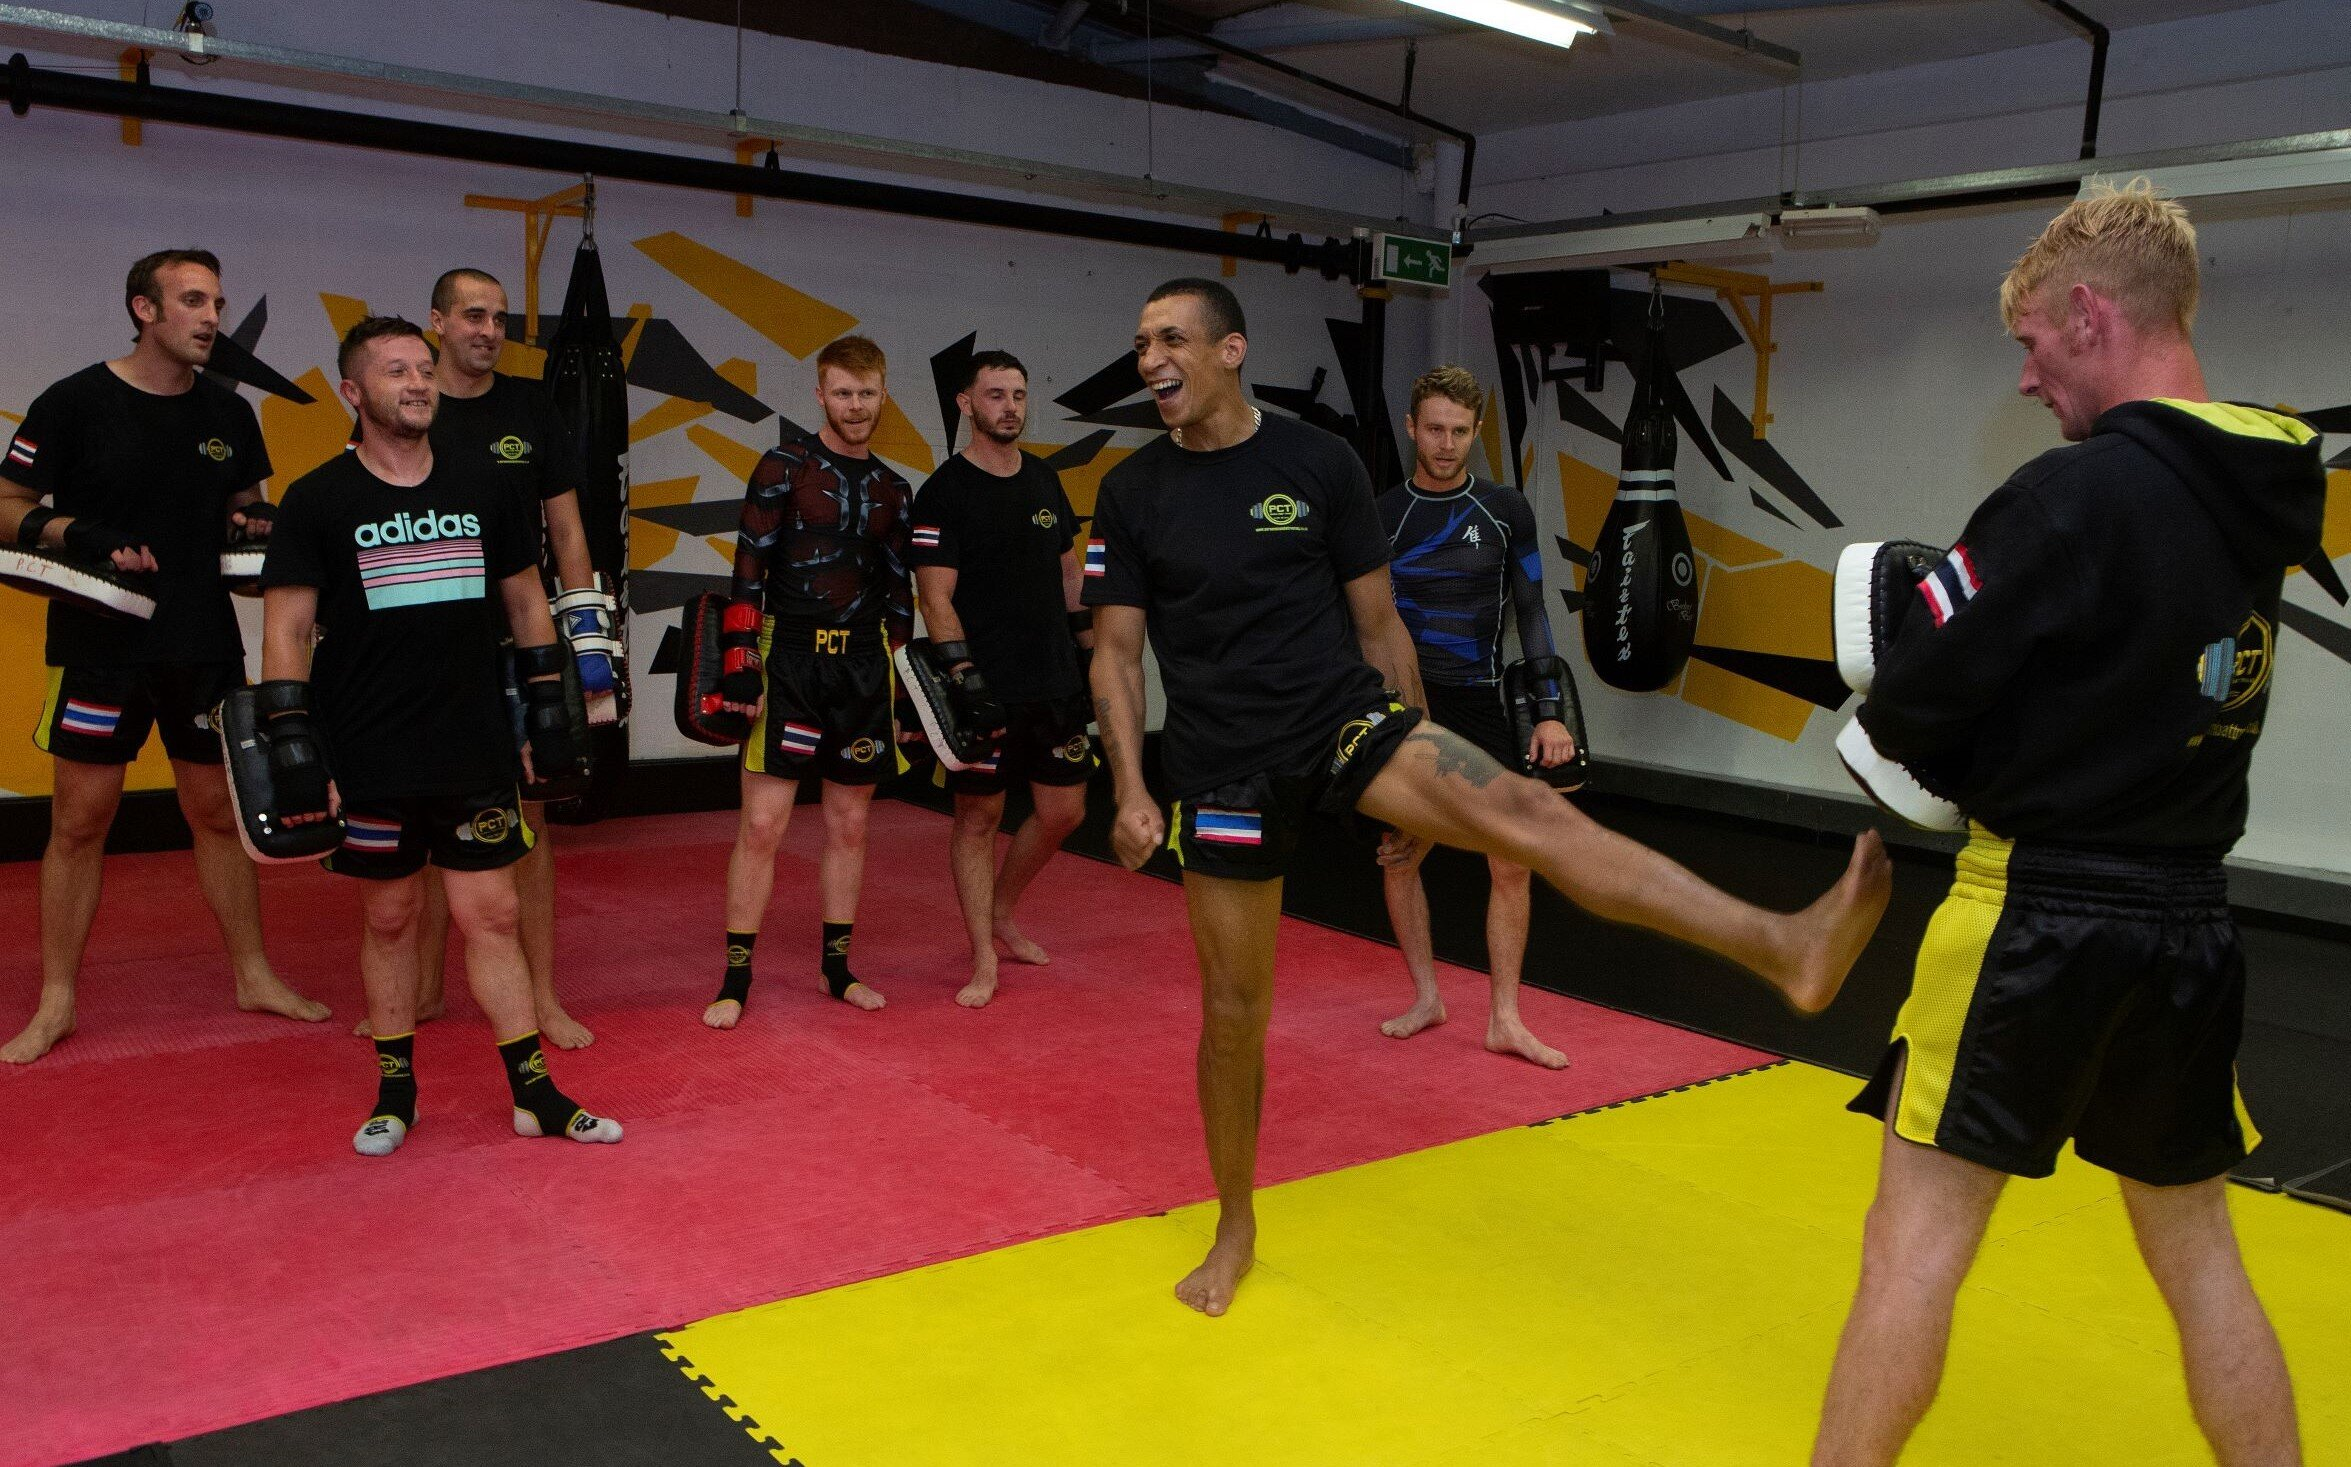 Sky leg laugh crop.jpg